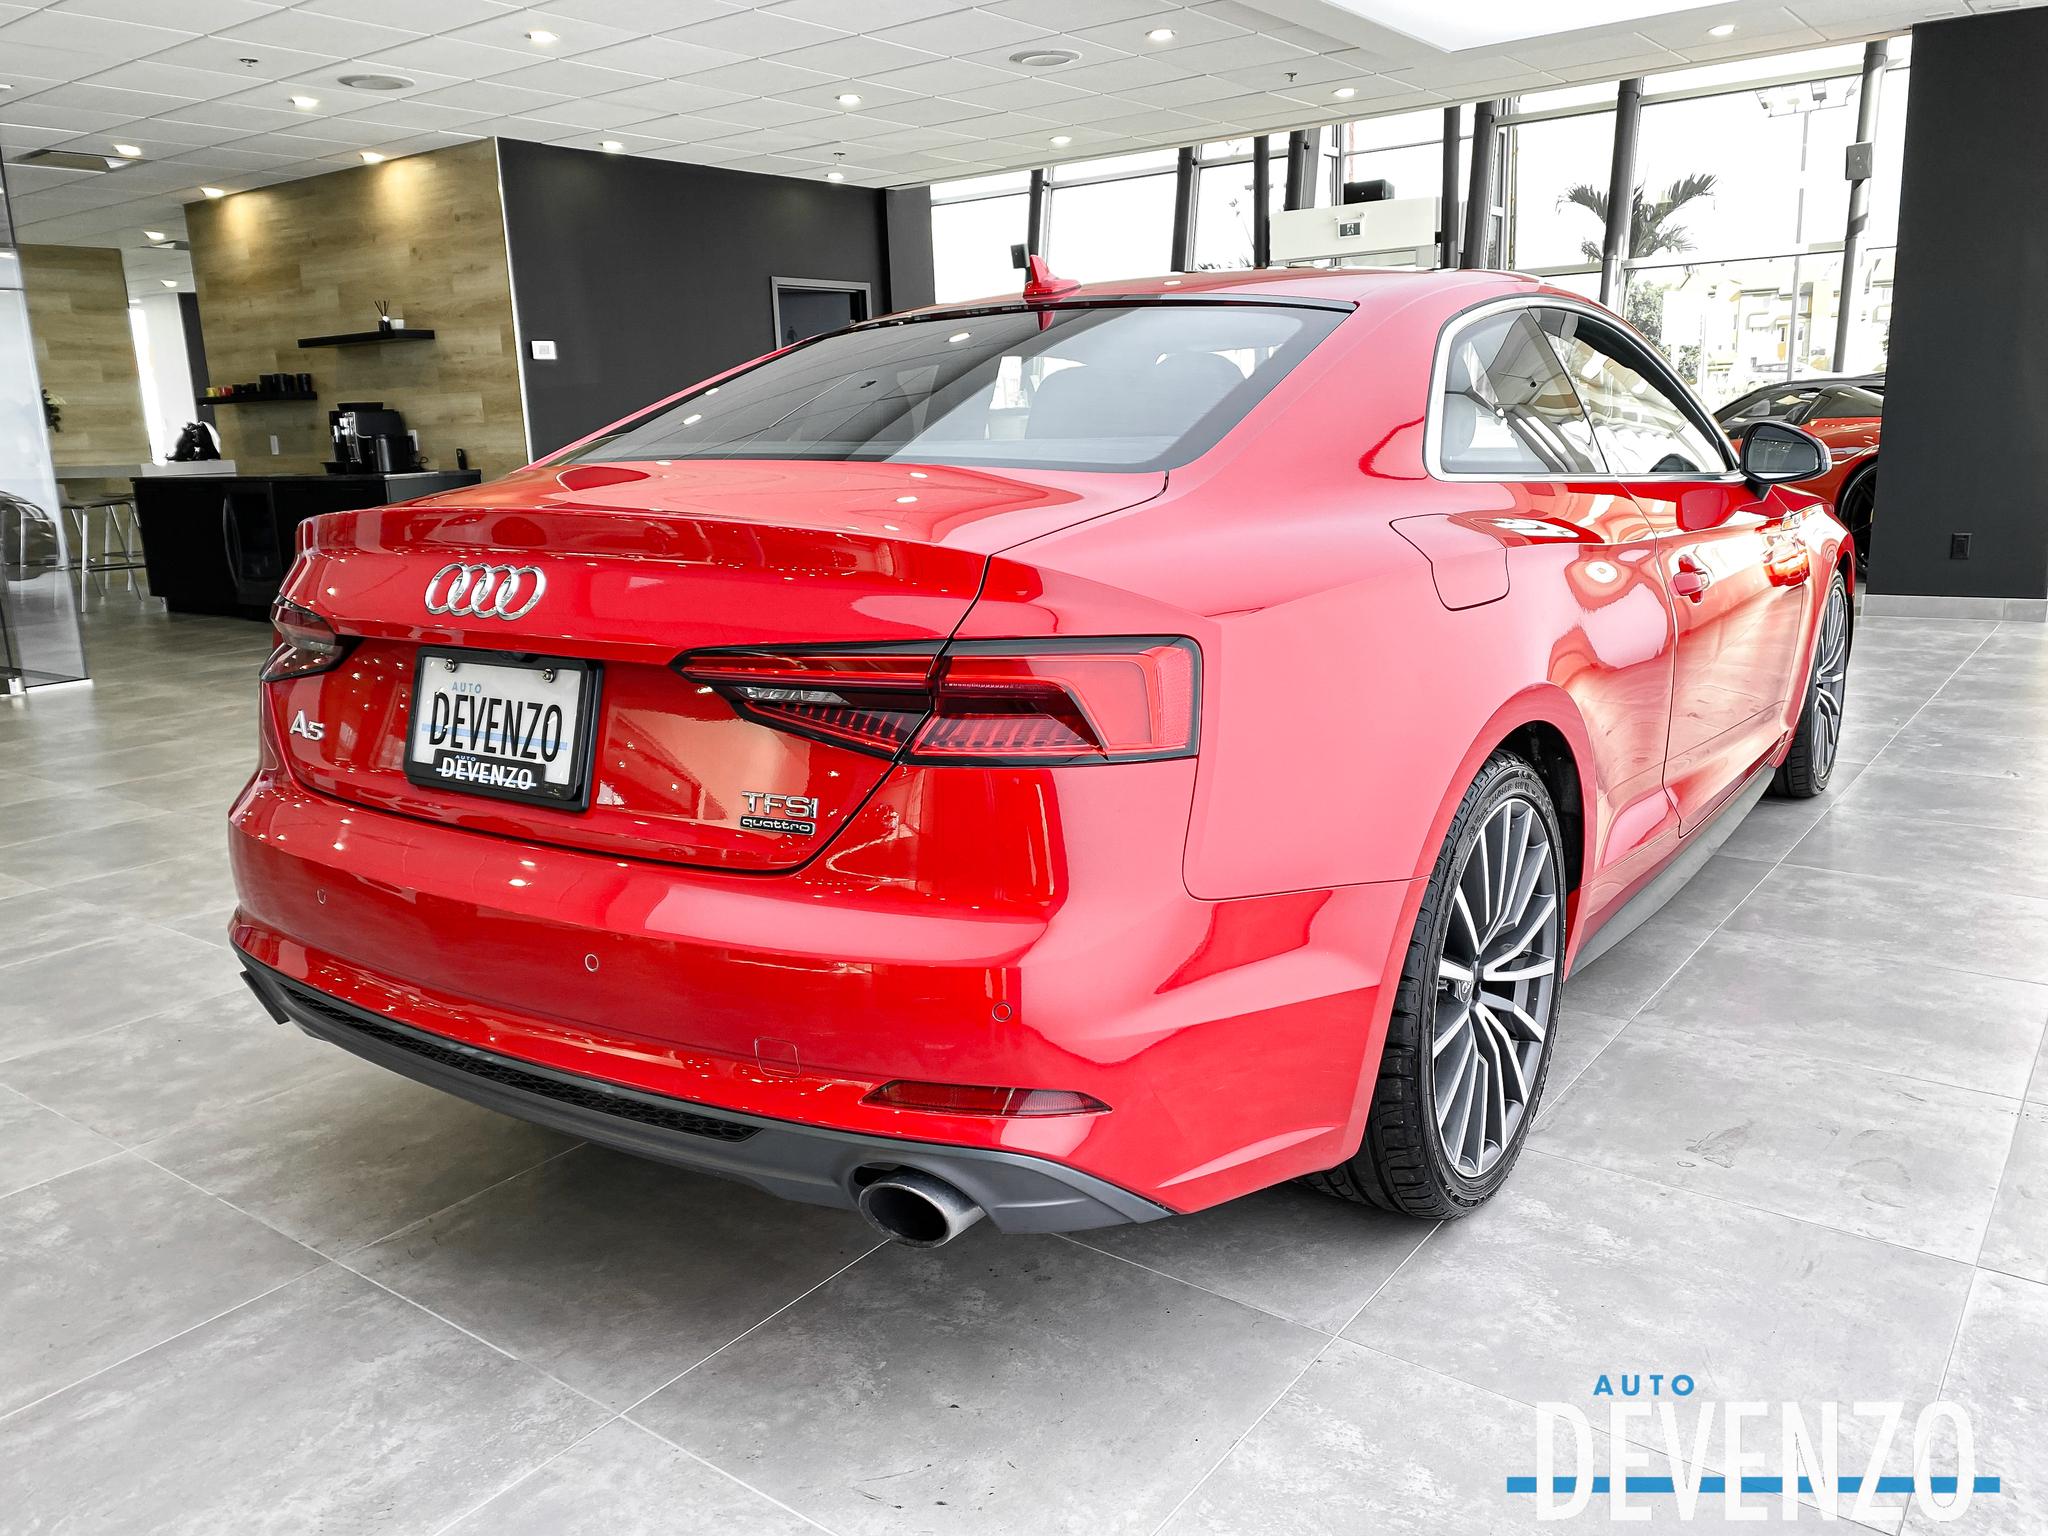 2018 Audi A5 Coupe TFSI QUATTRO PROGRESSIV S-LINE NAVIGATION PANO complet